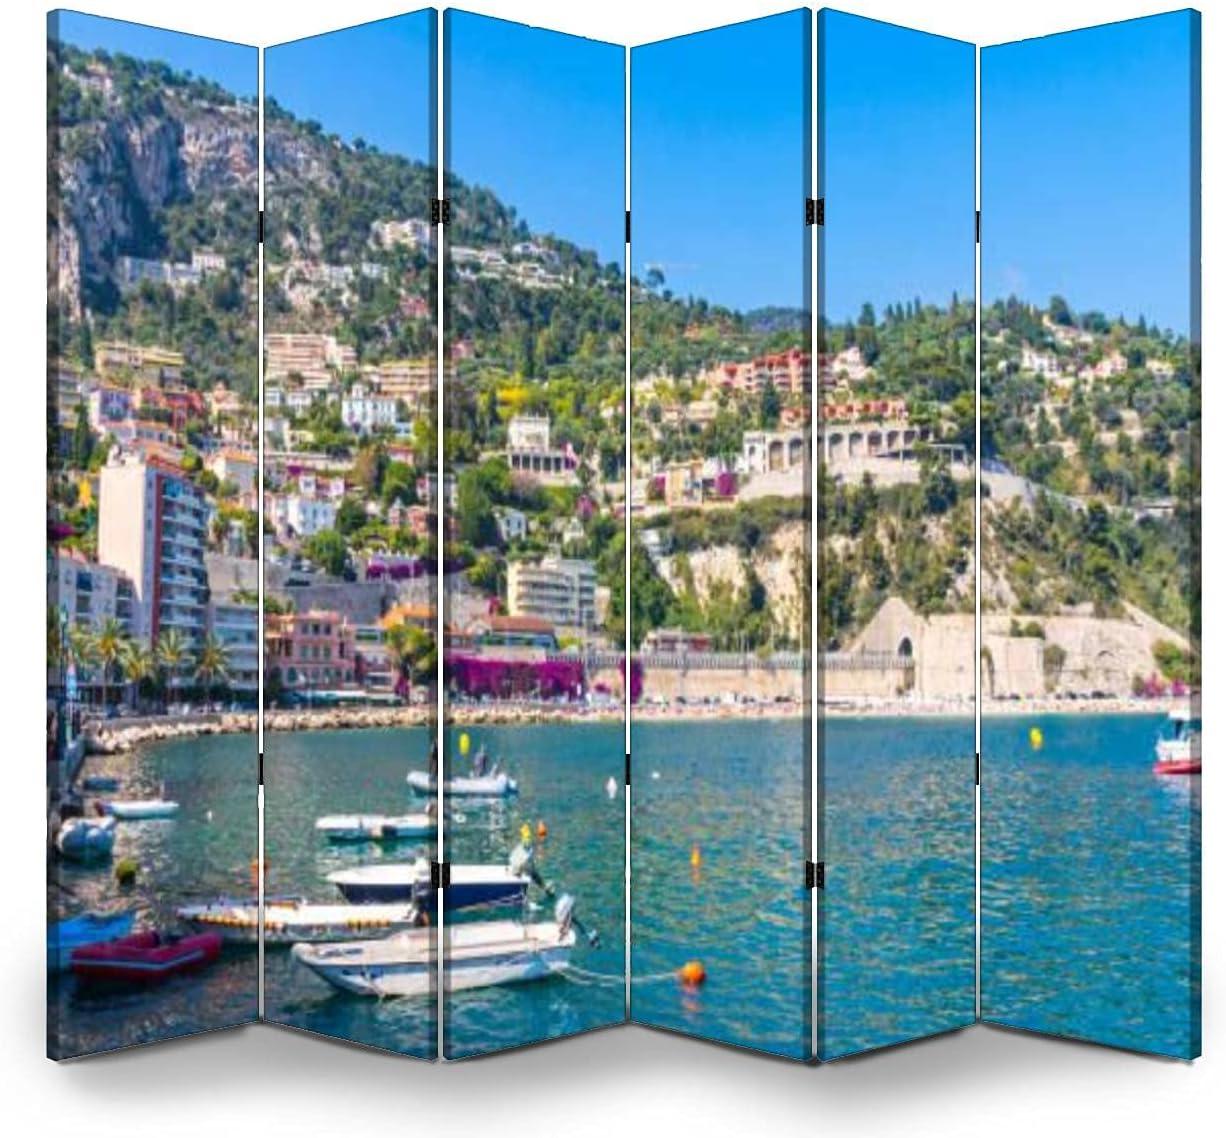 Dola-Dola 6 Panel Screen Free shipping New Room Franc Brand new sur Mer Villefranche Divider